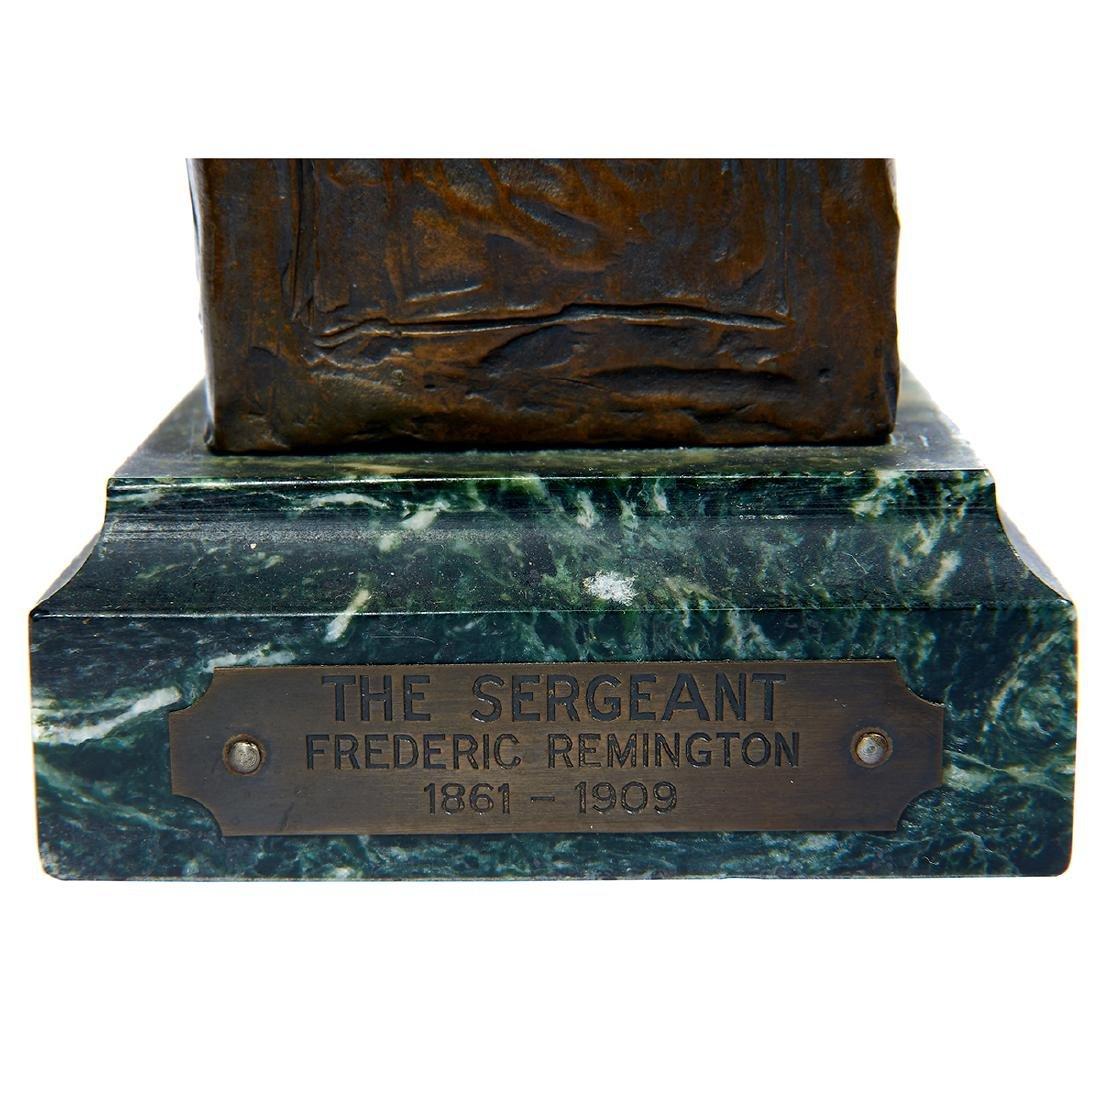 "after Frederick Remington, ""Sergeant"" Bronze Bust - 7"